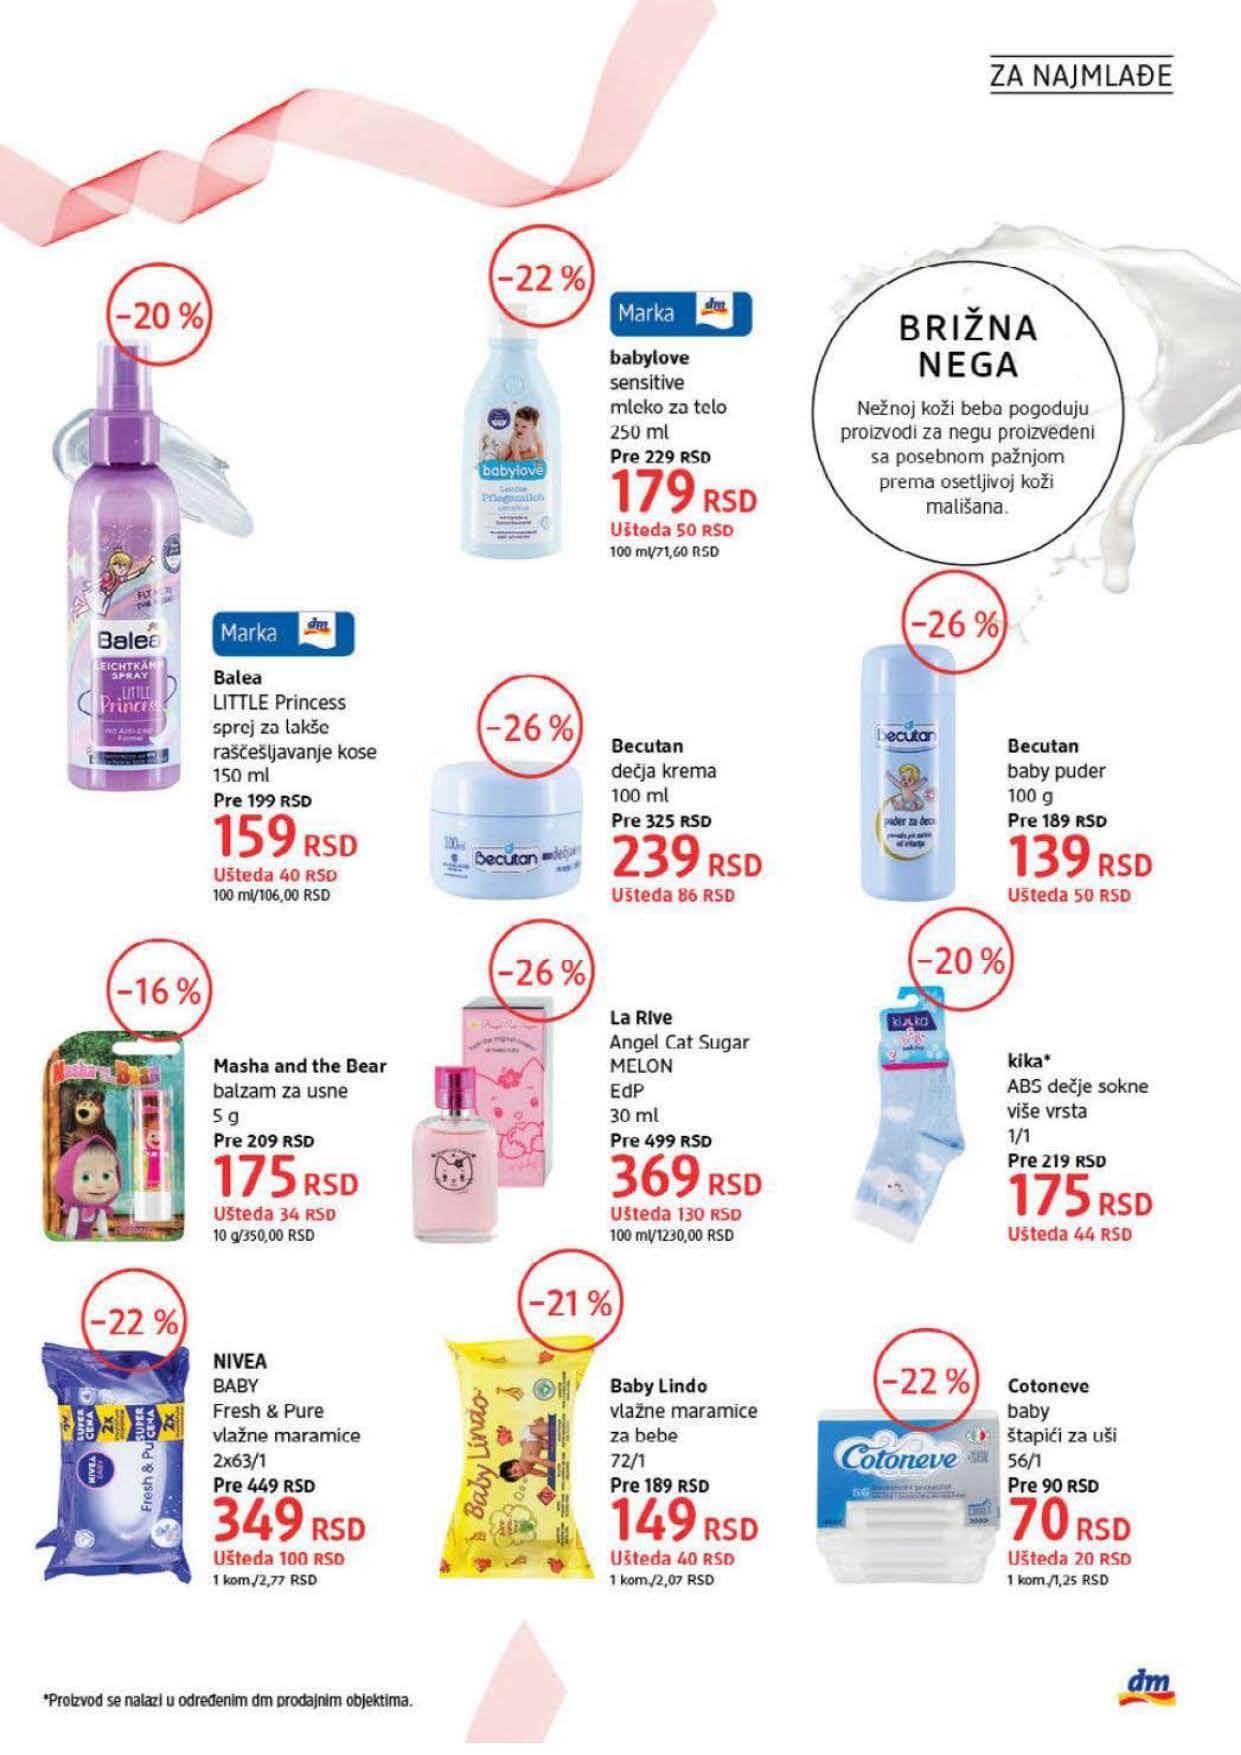 DM Katalog Srbija SEPTEMBAR 2021 1.9.2021. 30.9.2021. Page 29